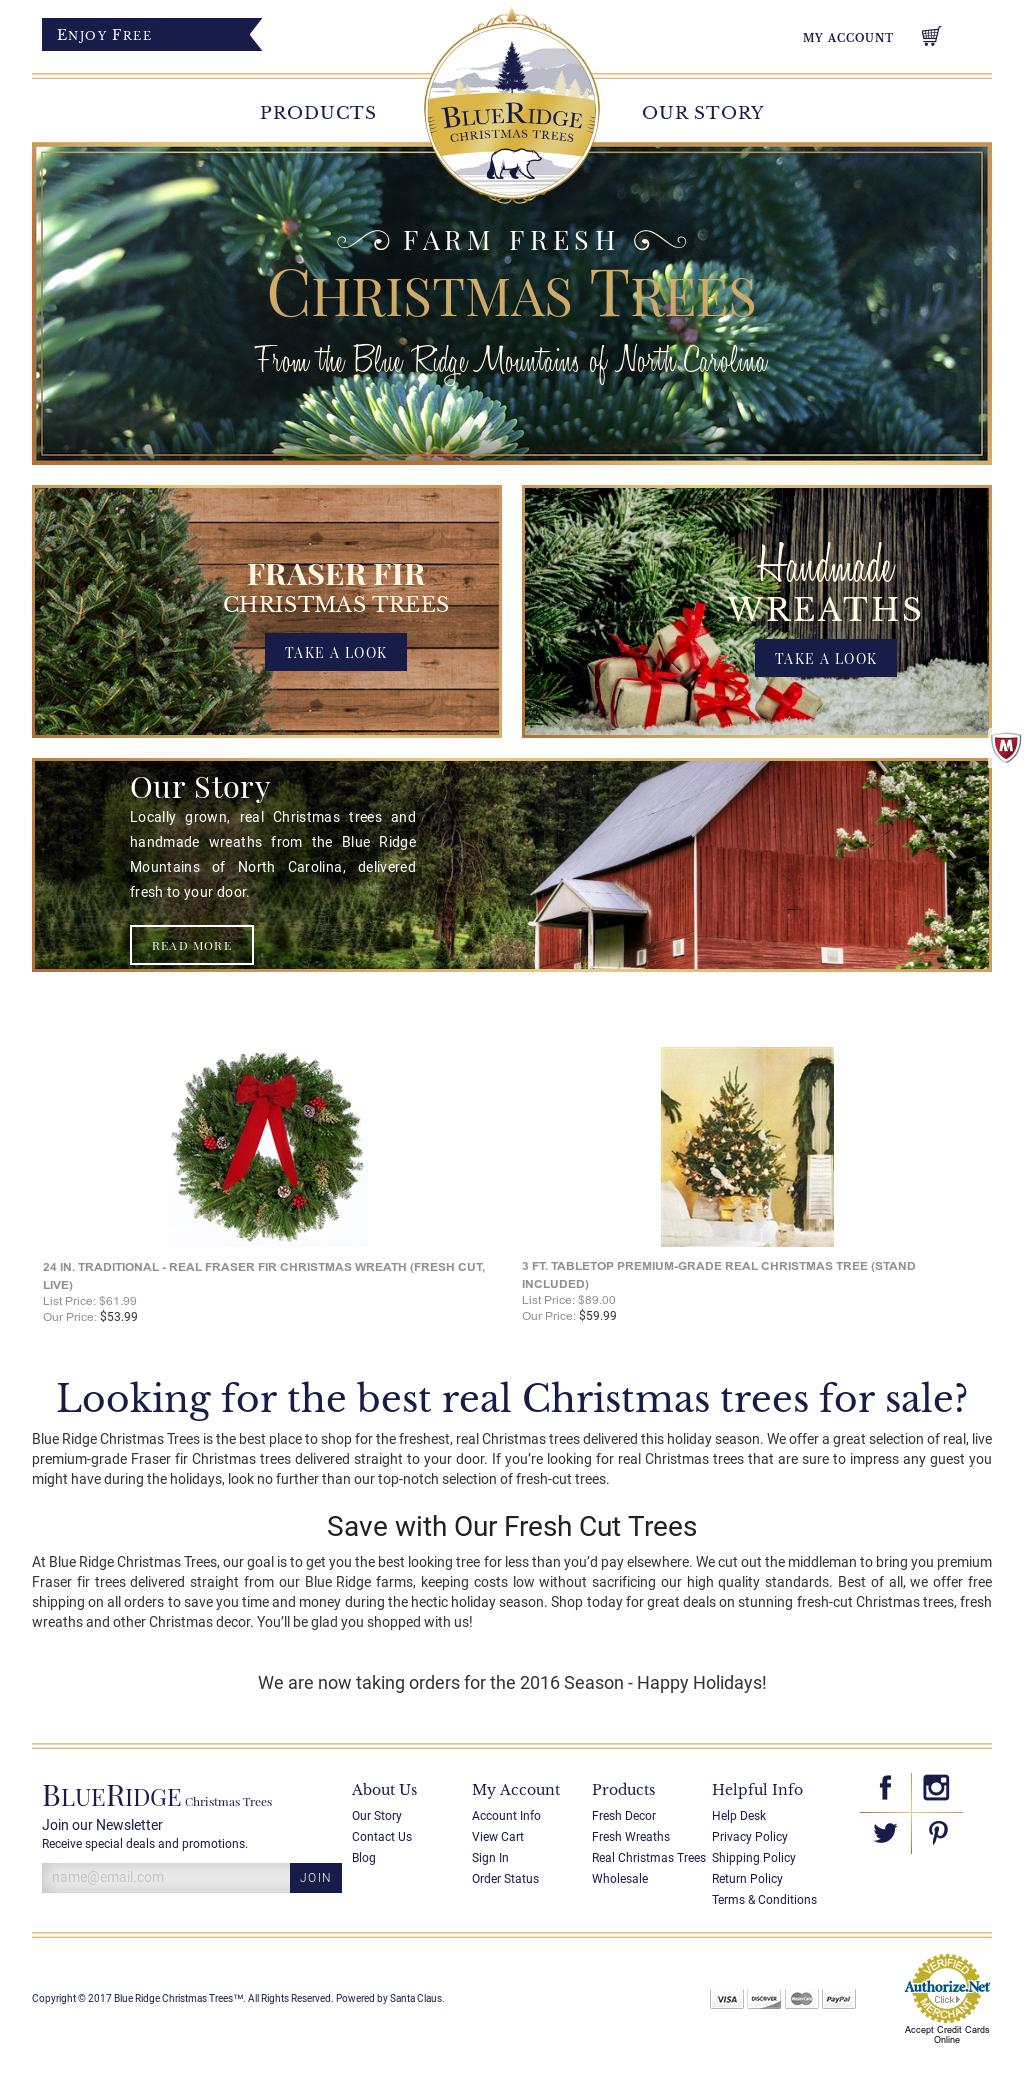 Garden Ridge Christmas Trees.Blue Ridge Christmas Trees Competitors Revenue And